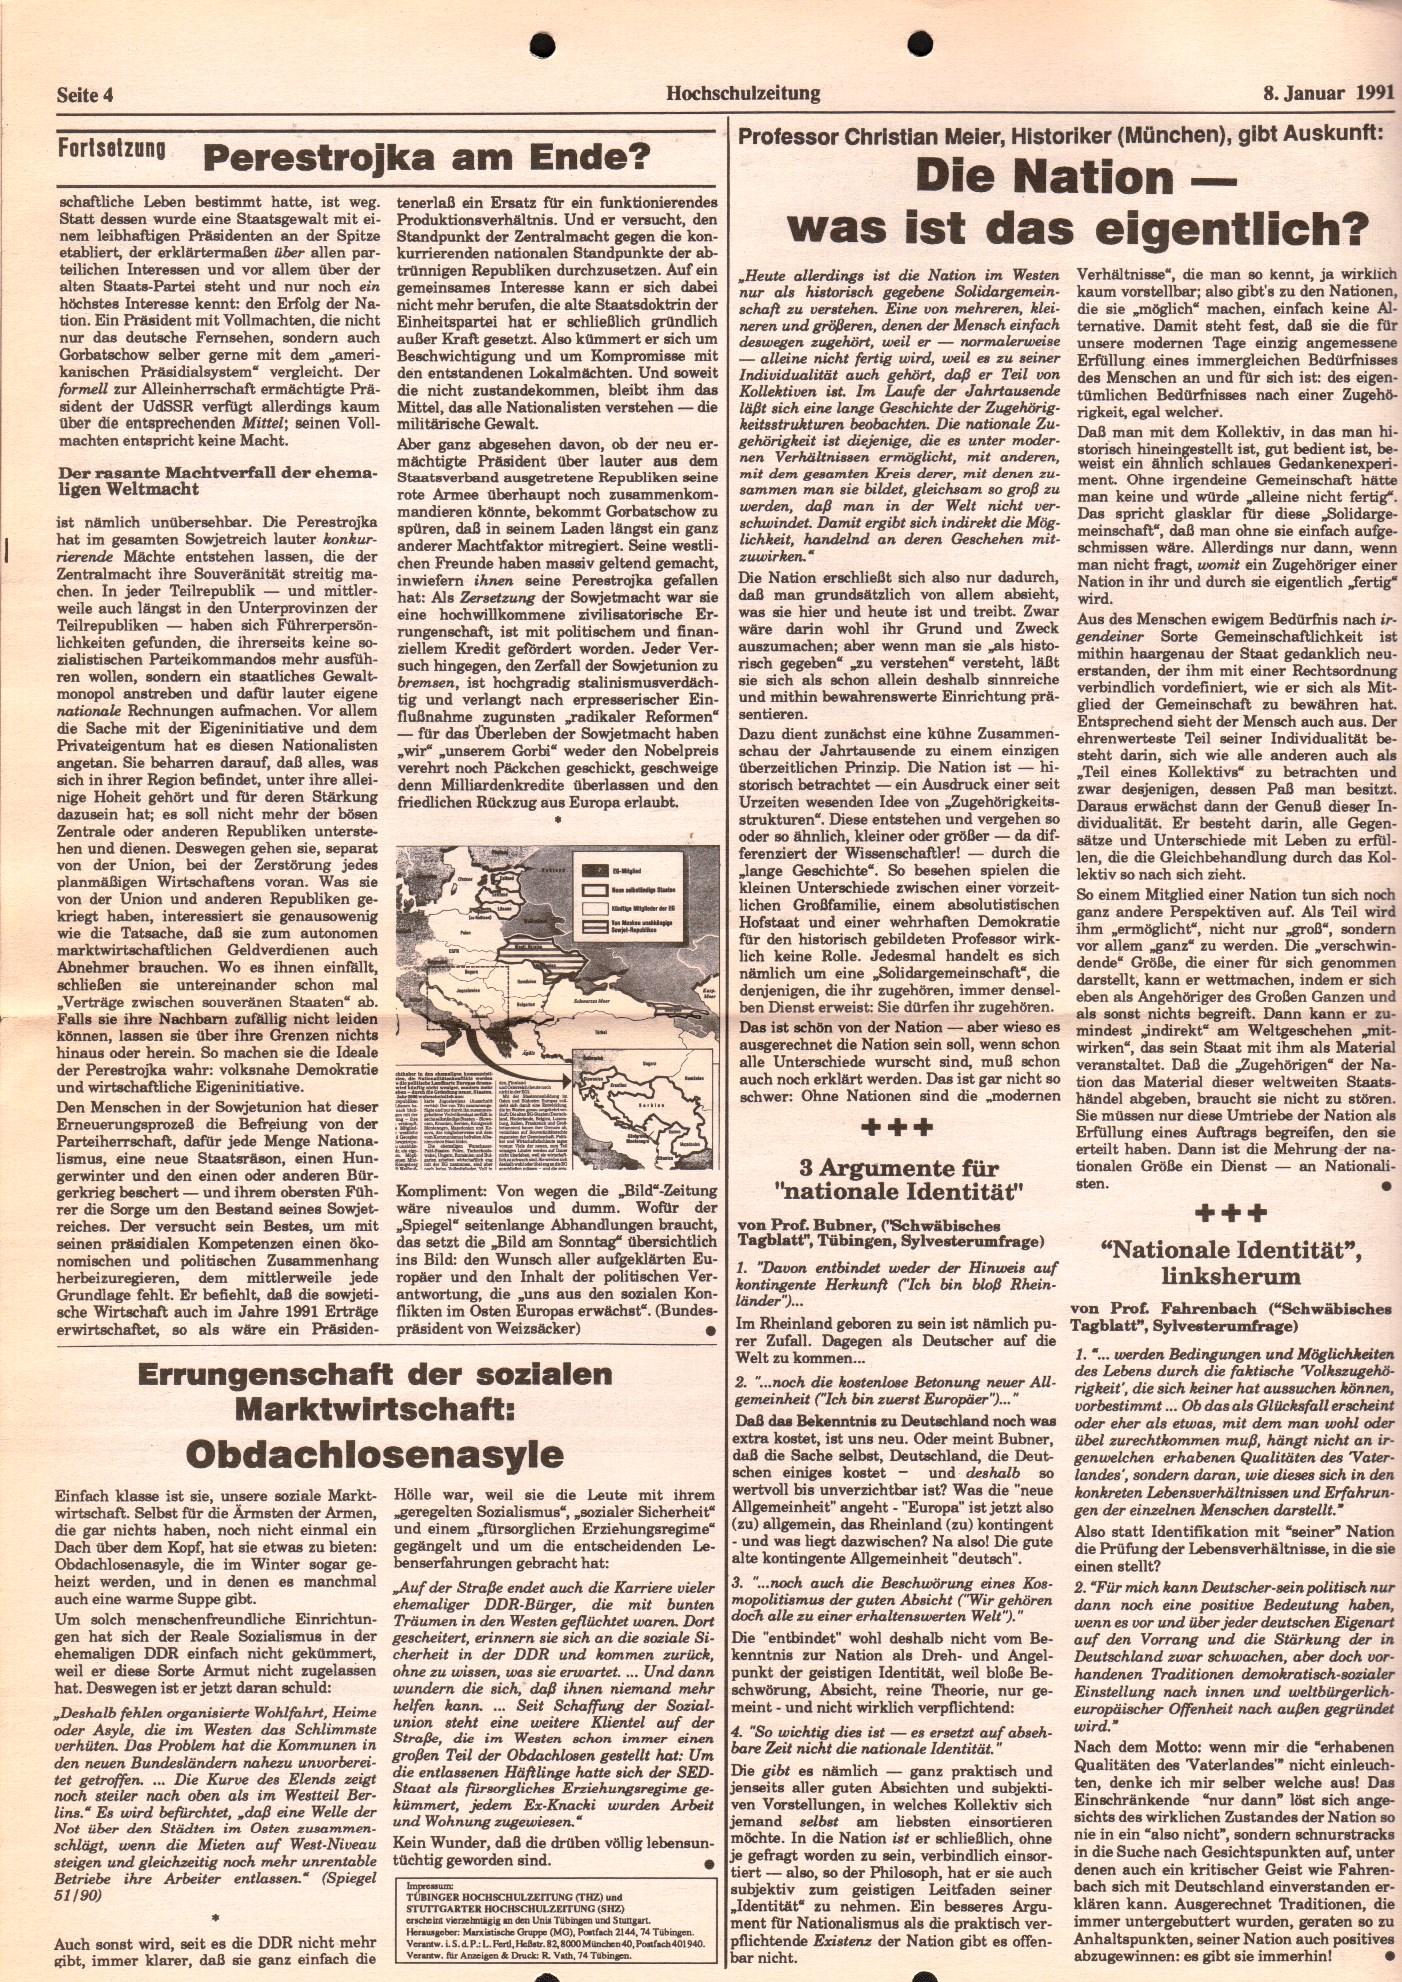 Stuttgart_MG_Hochschulzeitung_1991_01_04